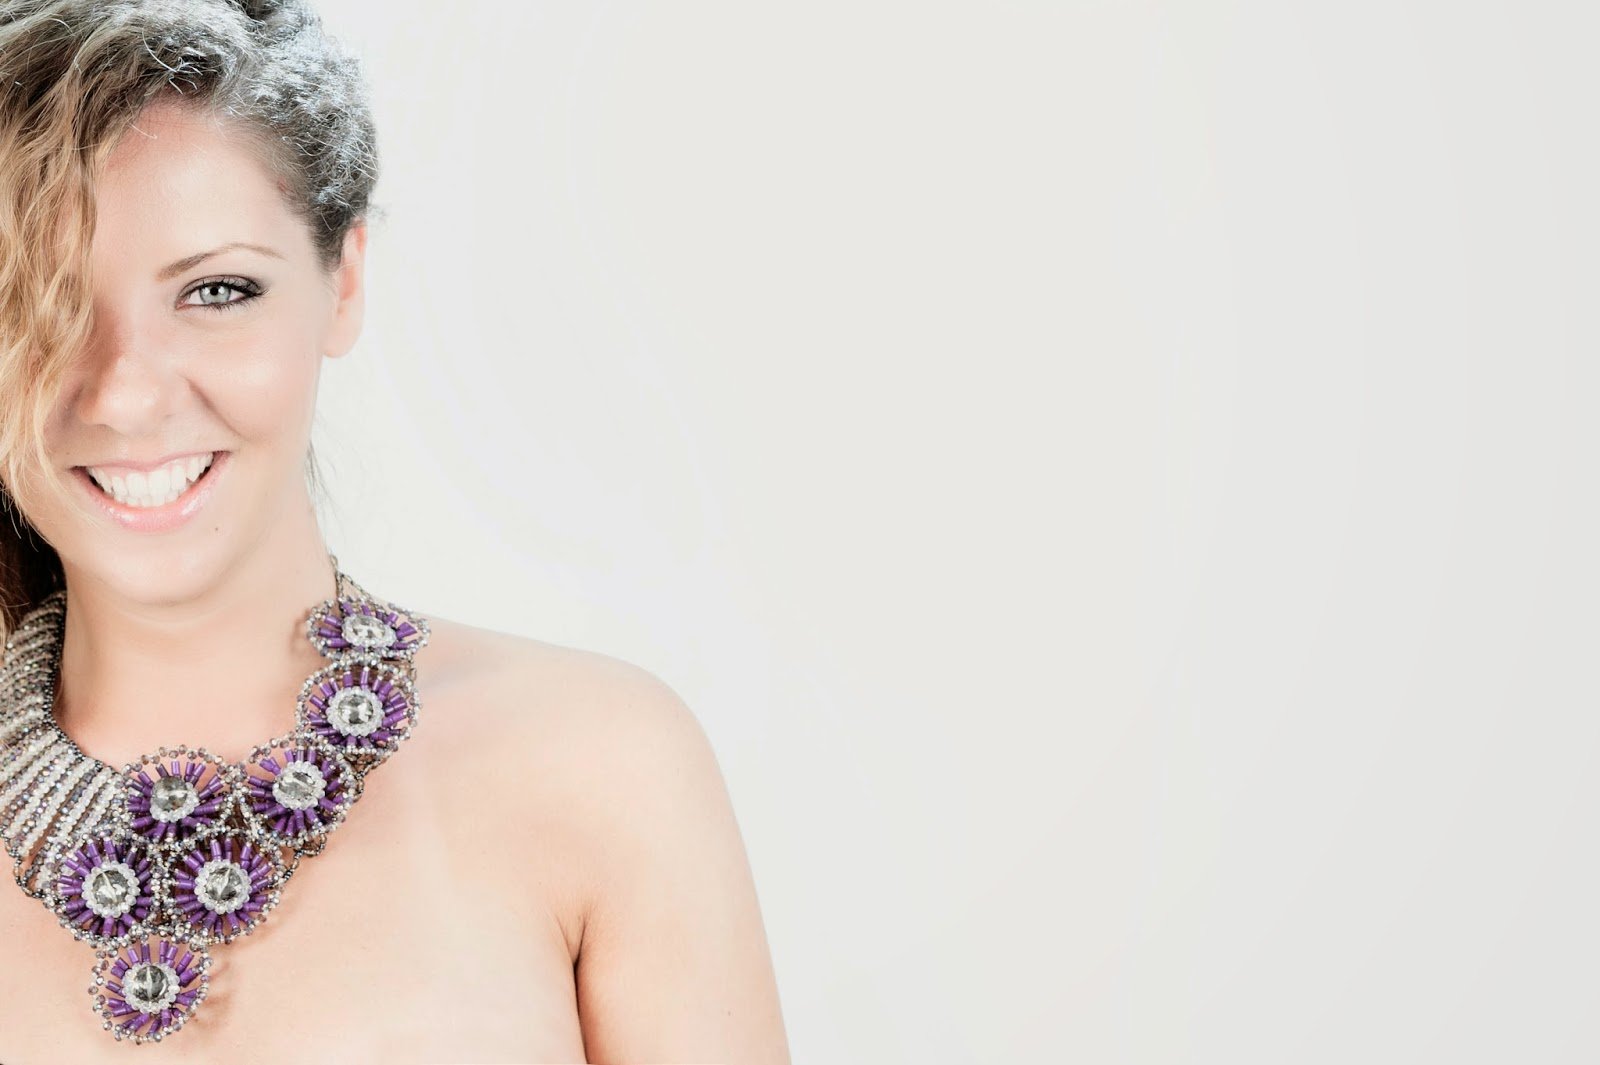 ottaviani, ilaria morelli, ida galati, stand out fashion project, marco gentile